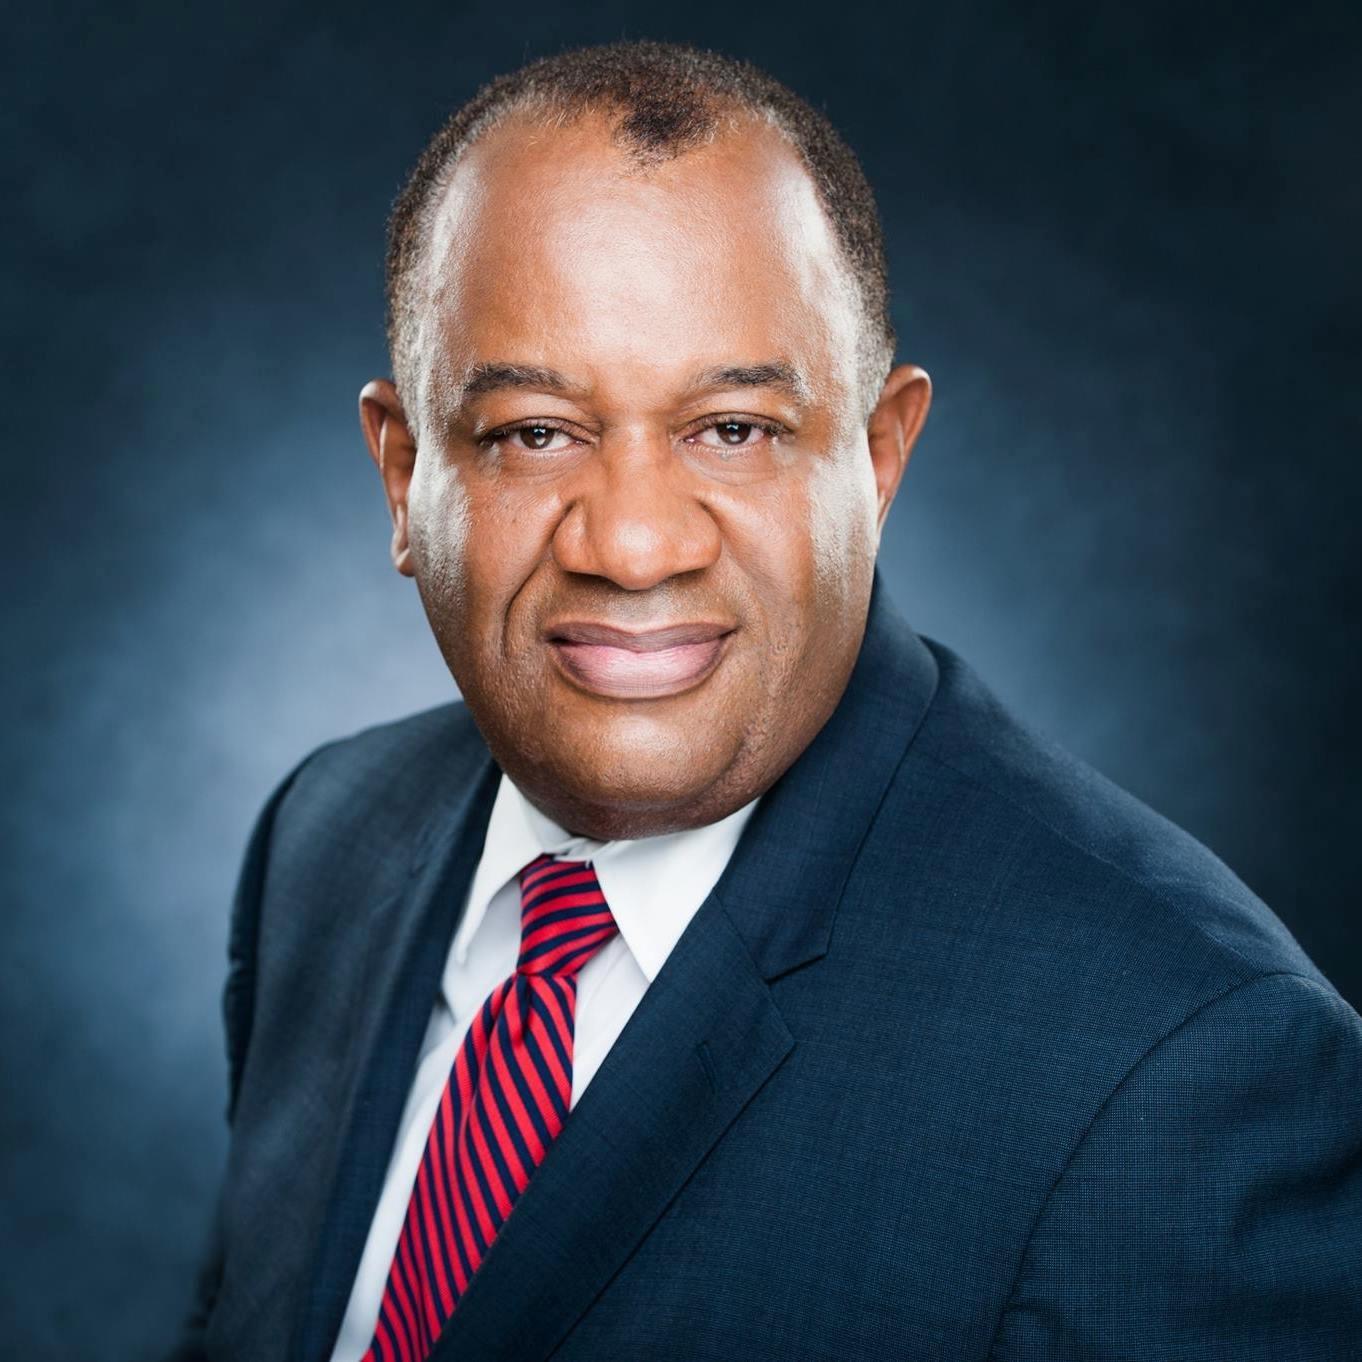 LINWOOD PARKER JONES Financial Professional & Insurance Agent